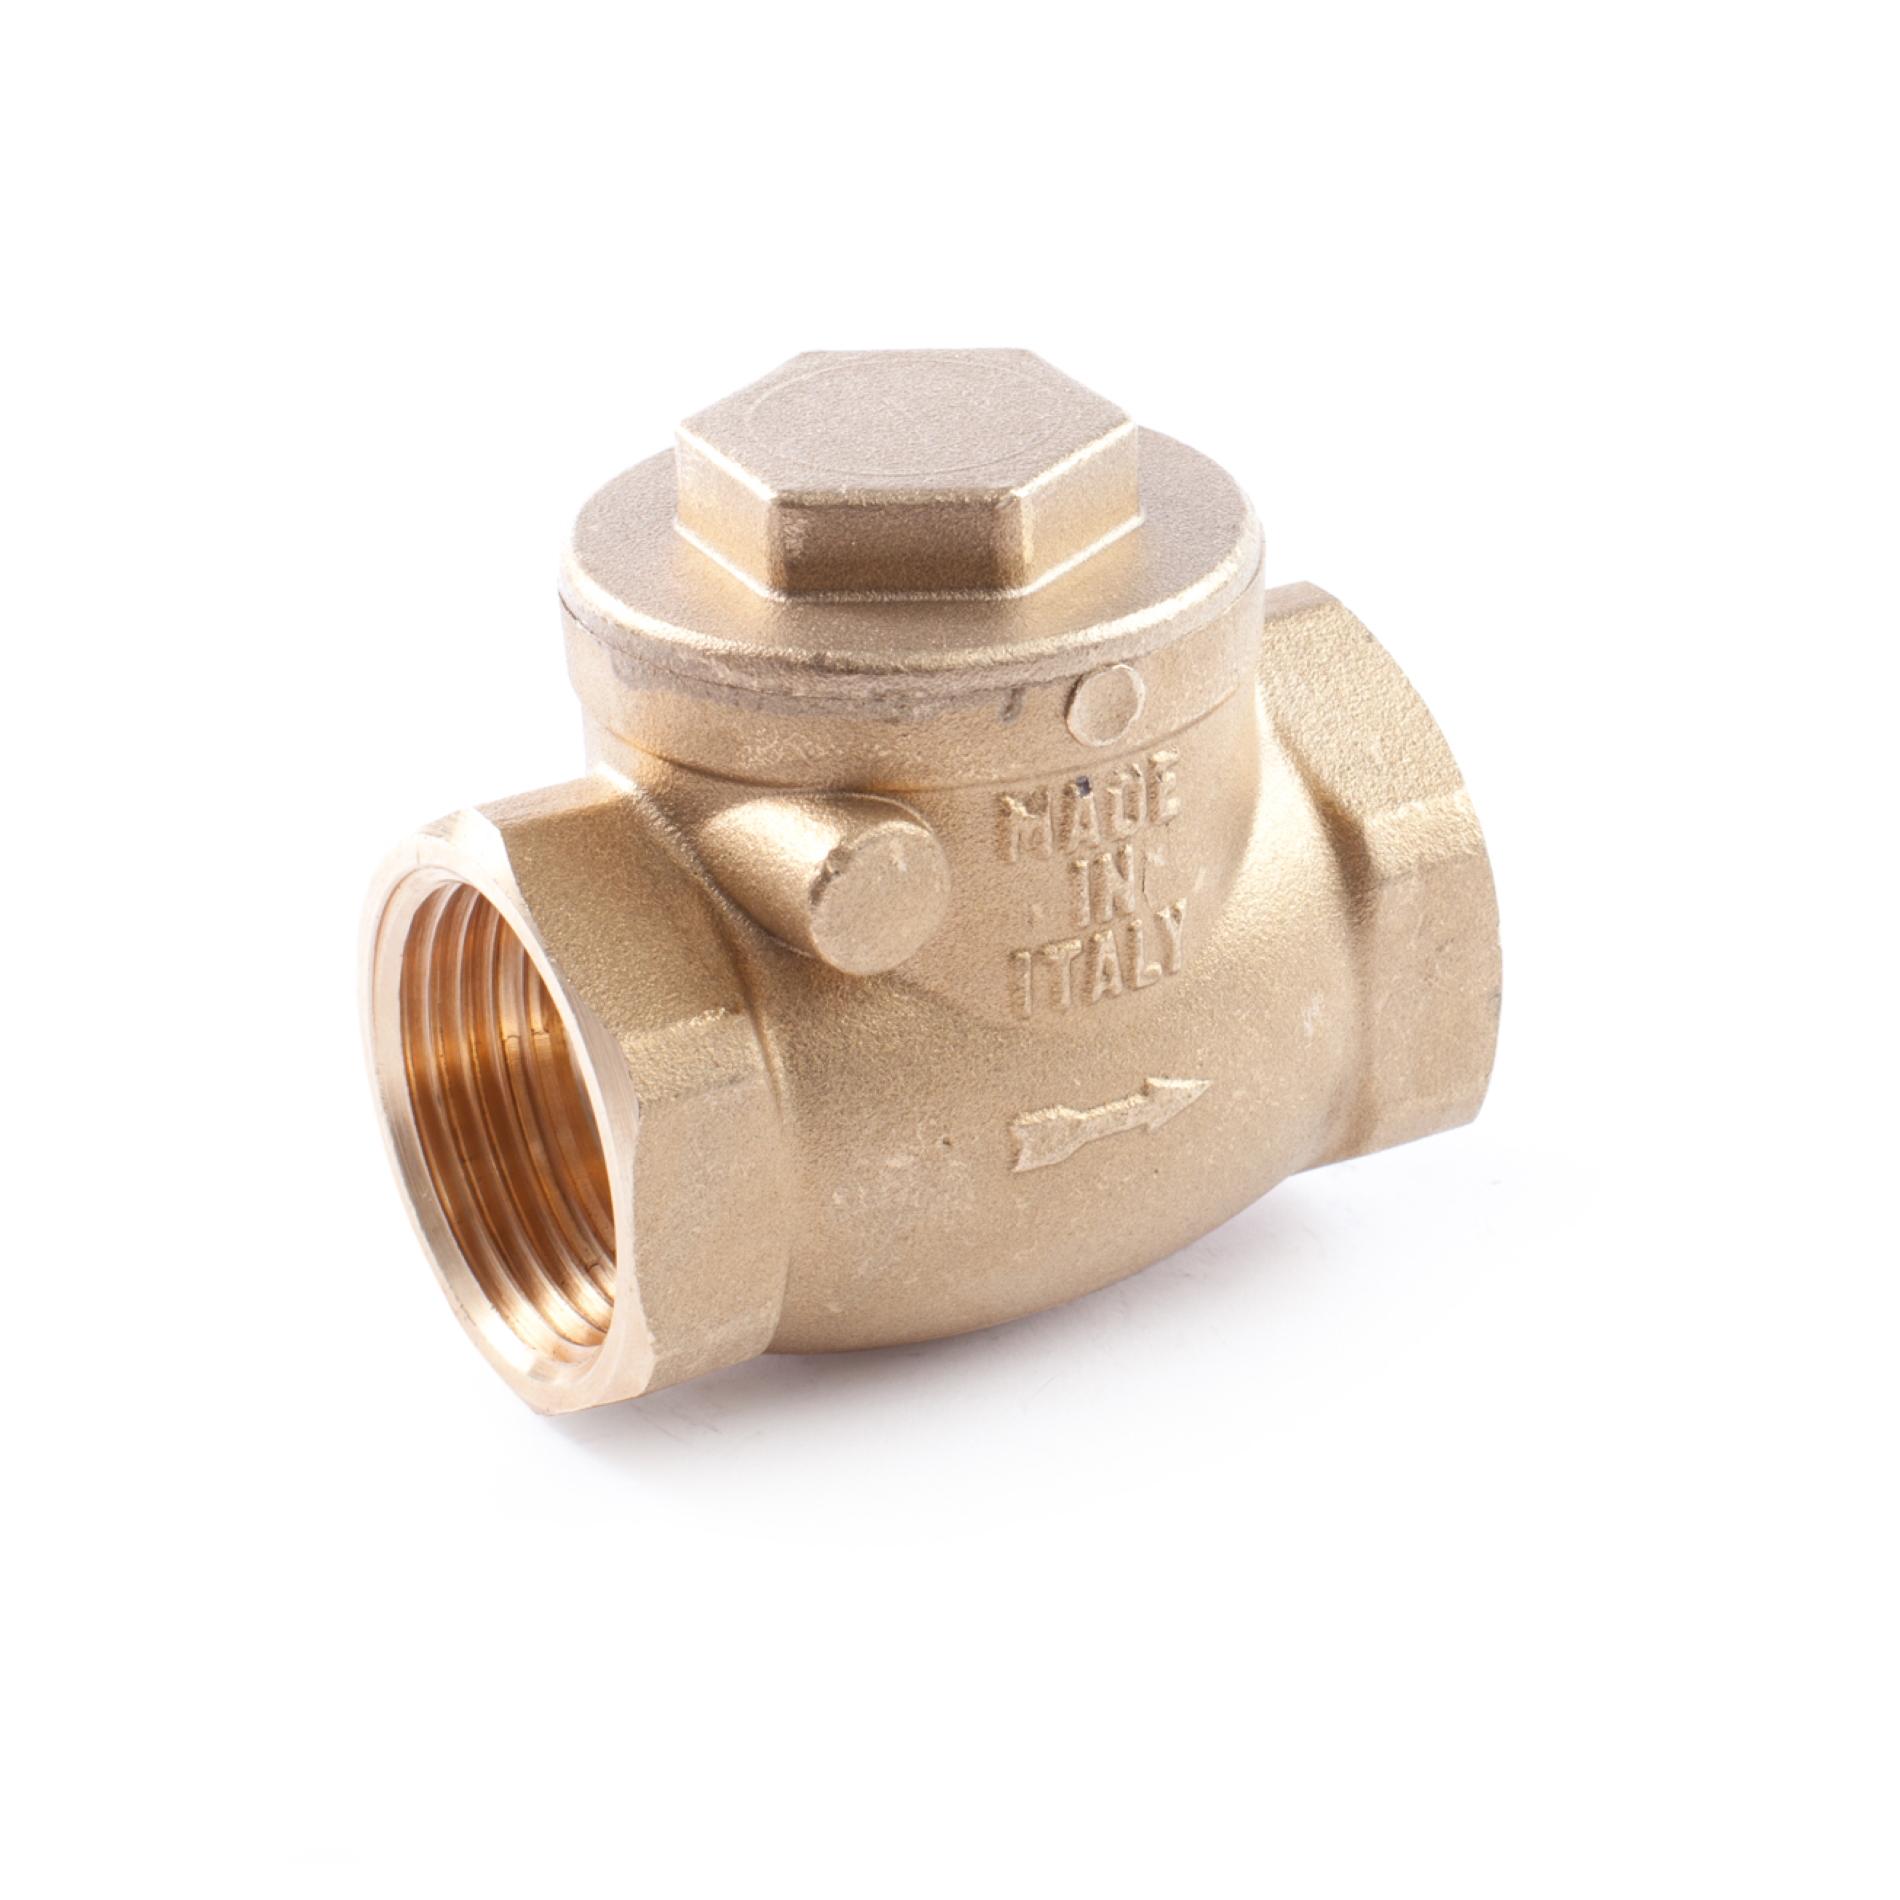 401 Valvola clapet ottone sede metallica Brass swing check valve metal disc